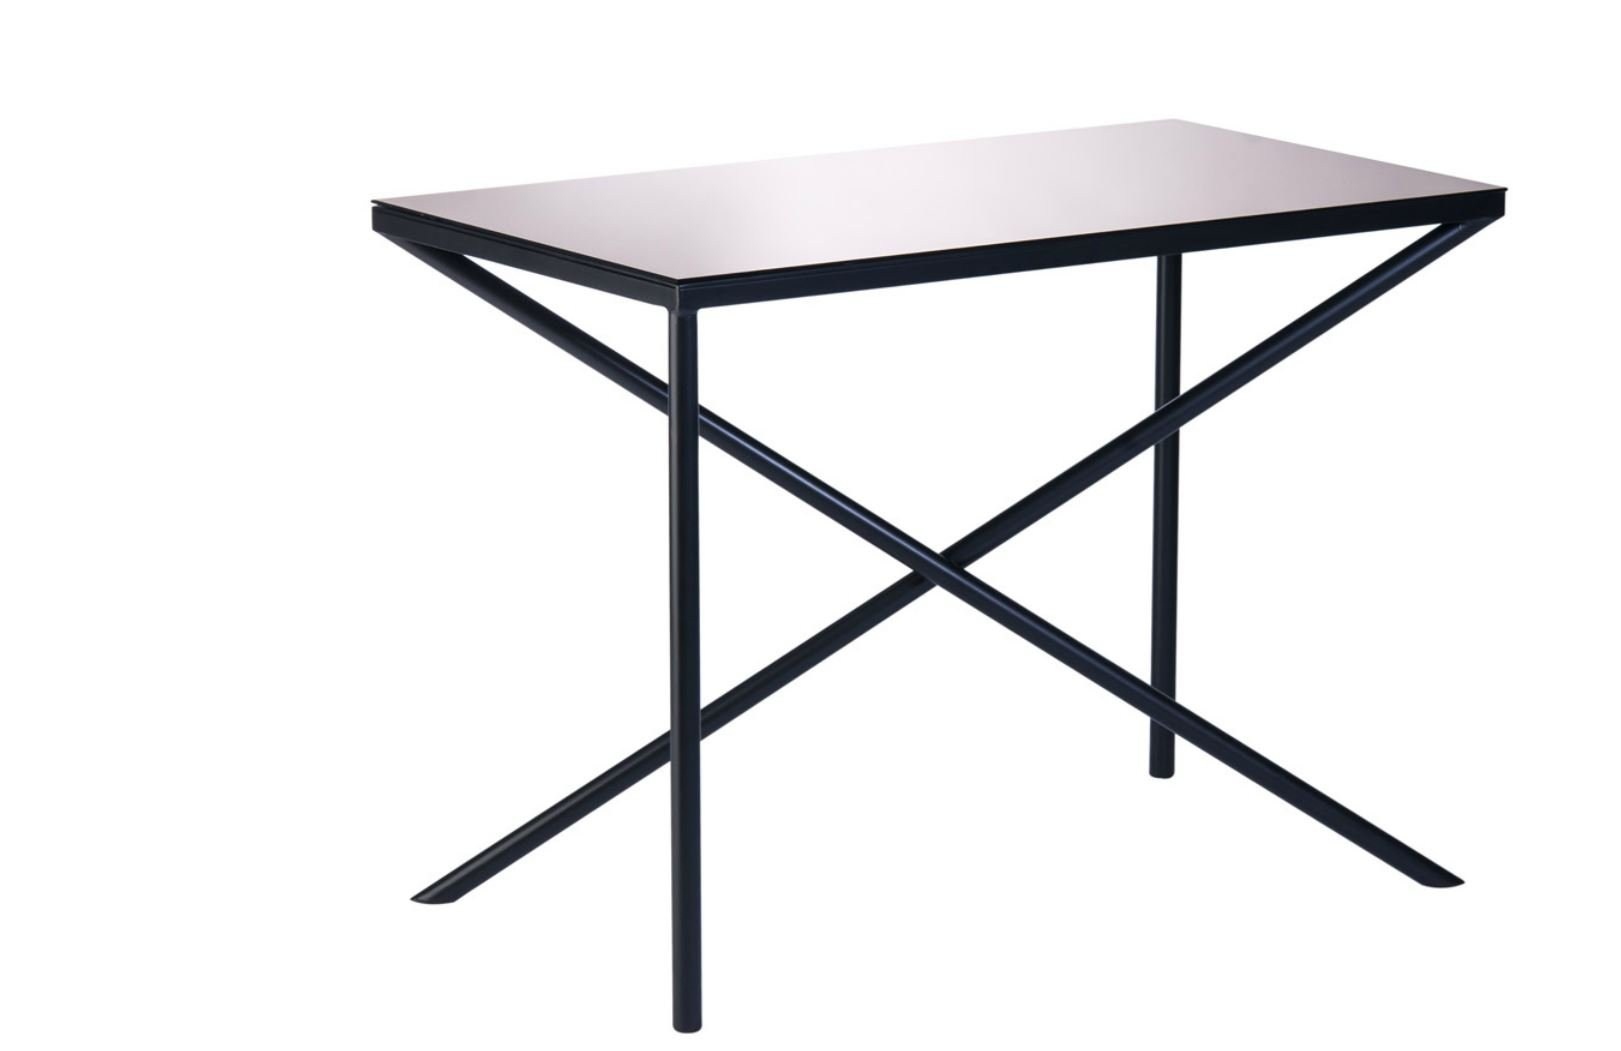 Rectangular Steel Table Illusion By Objekto Design Roberta